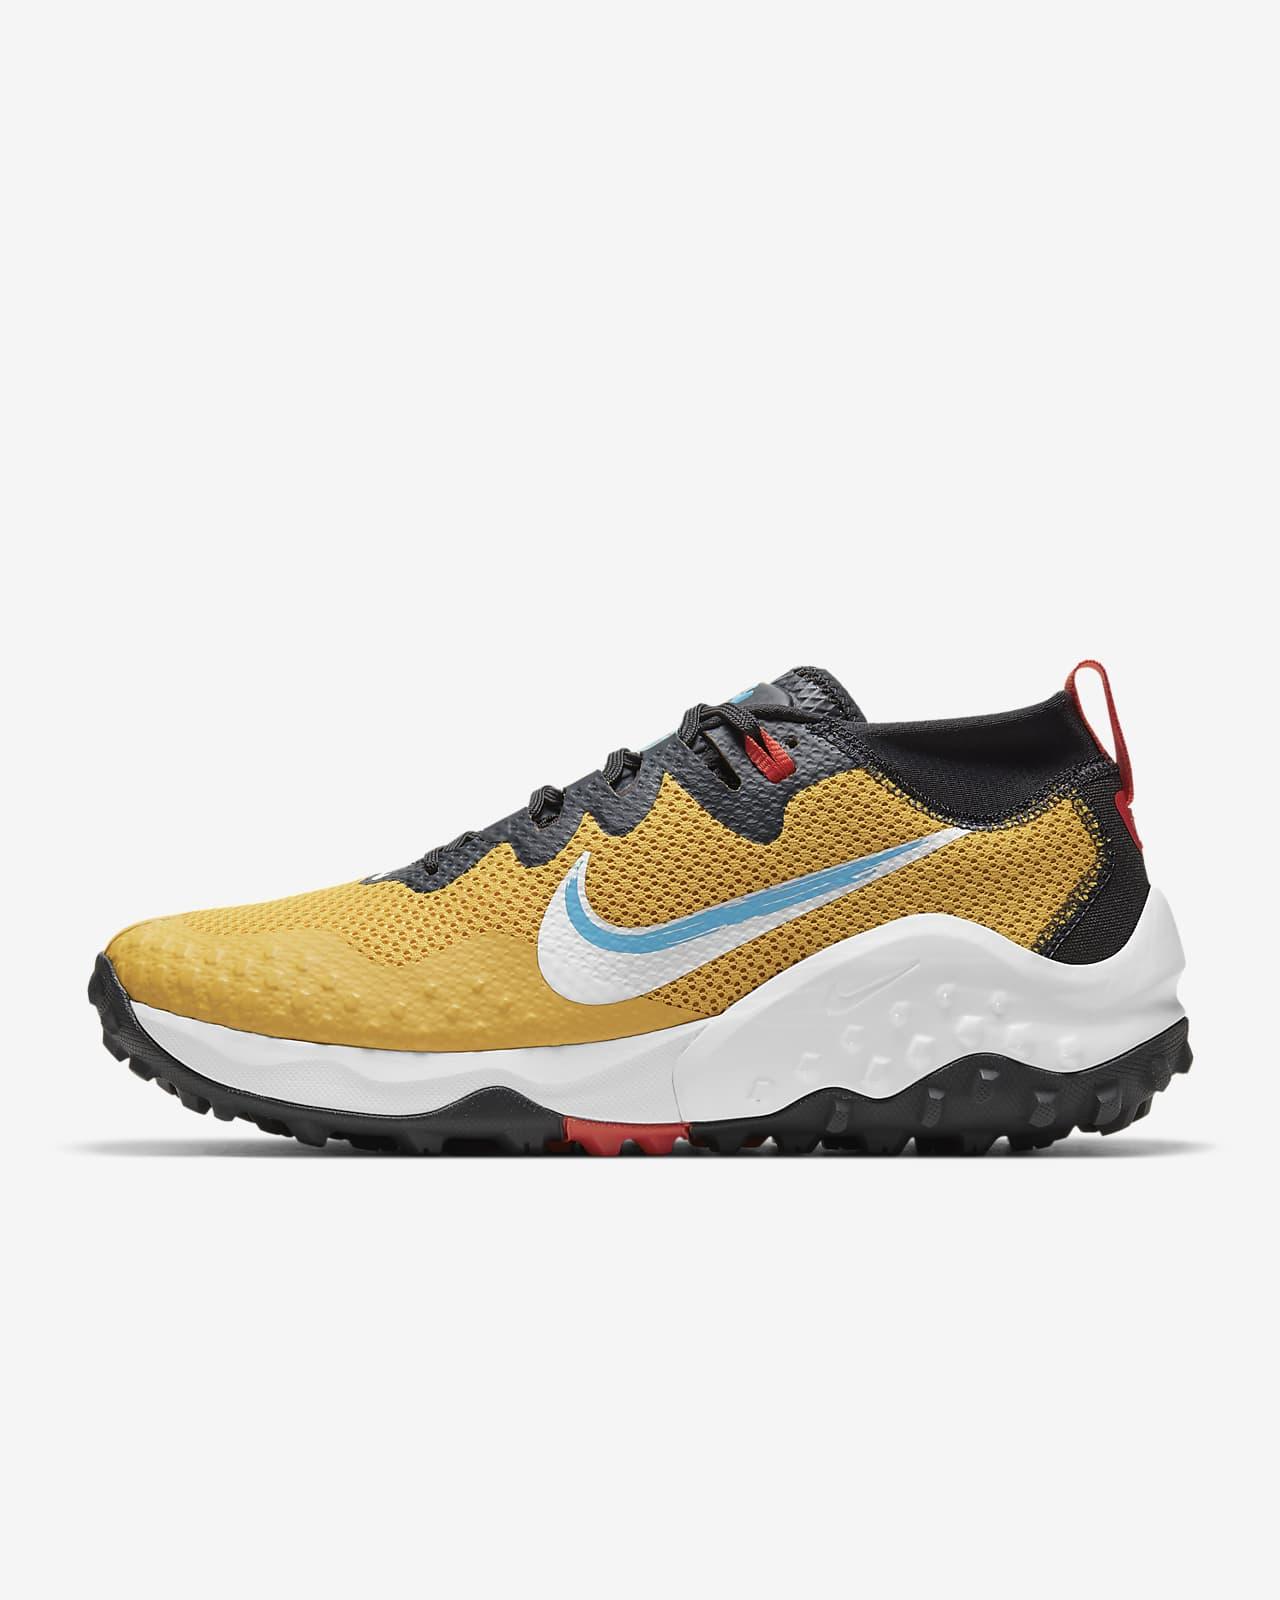 Nike Wildhorse 7 Trail Zapatillas de trail running - Hombre